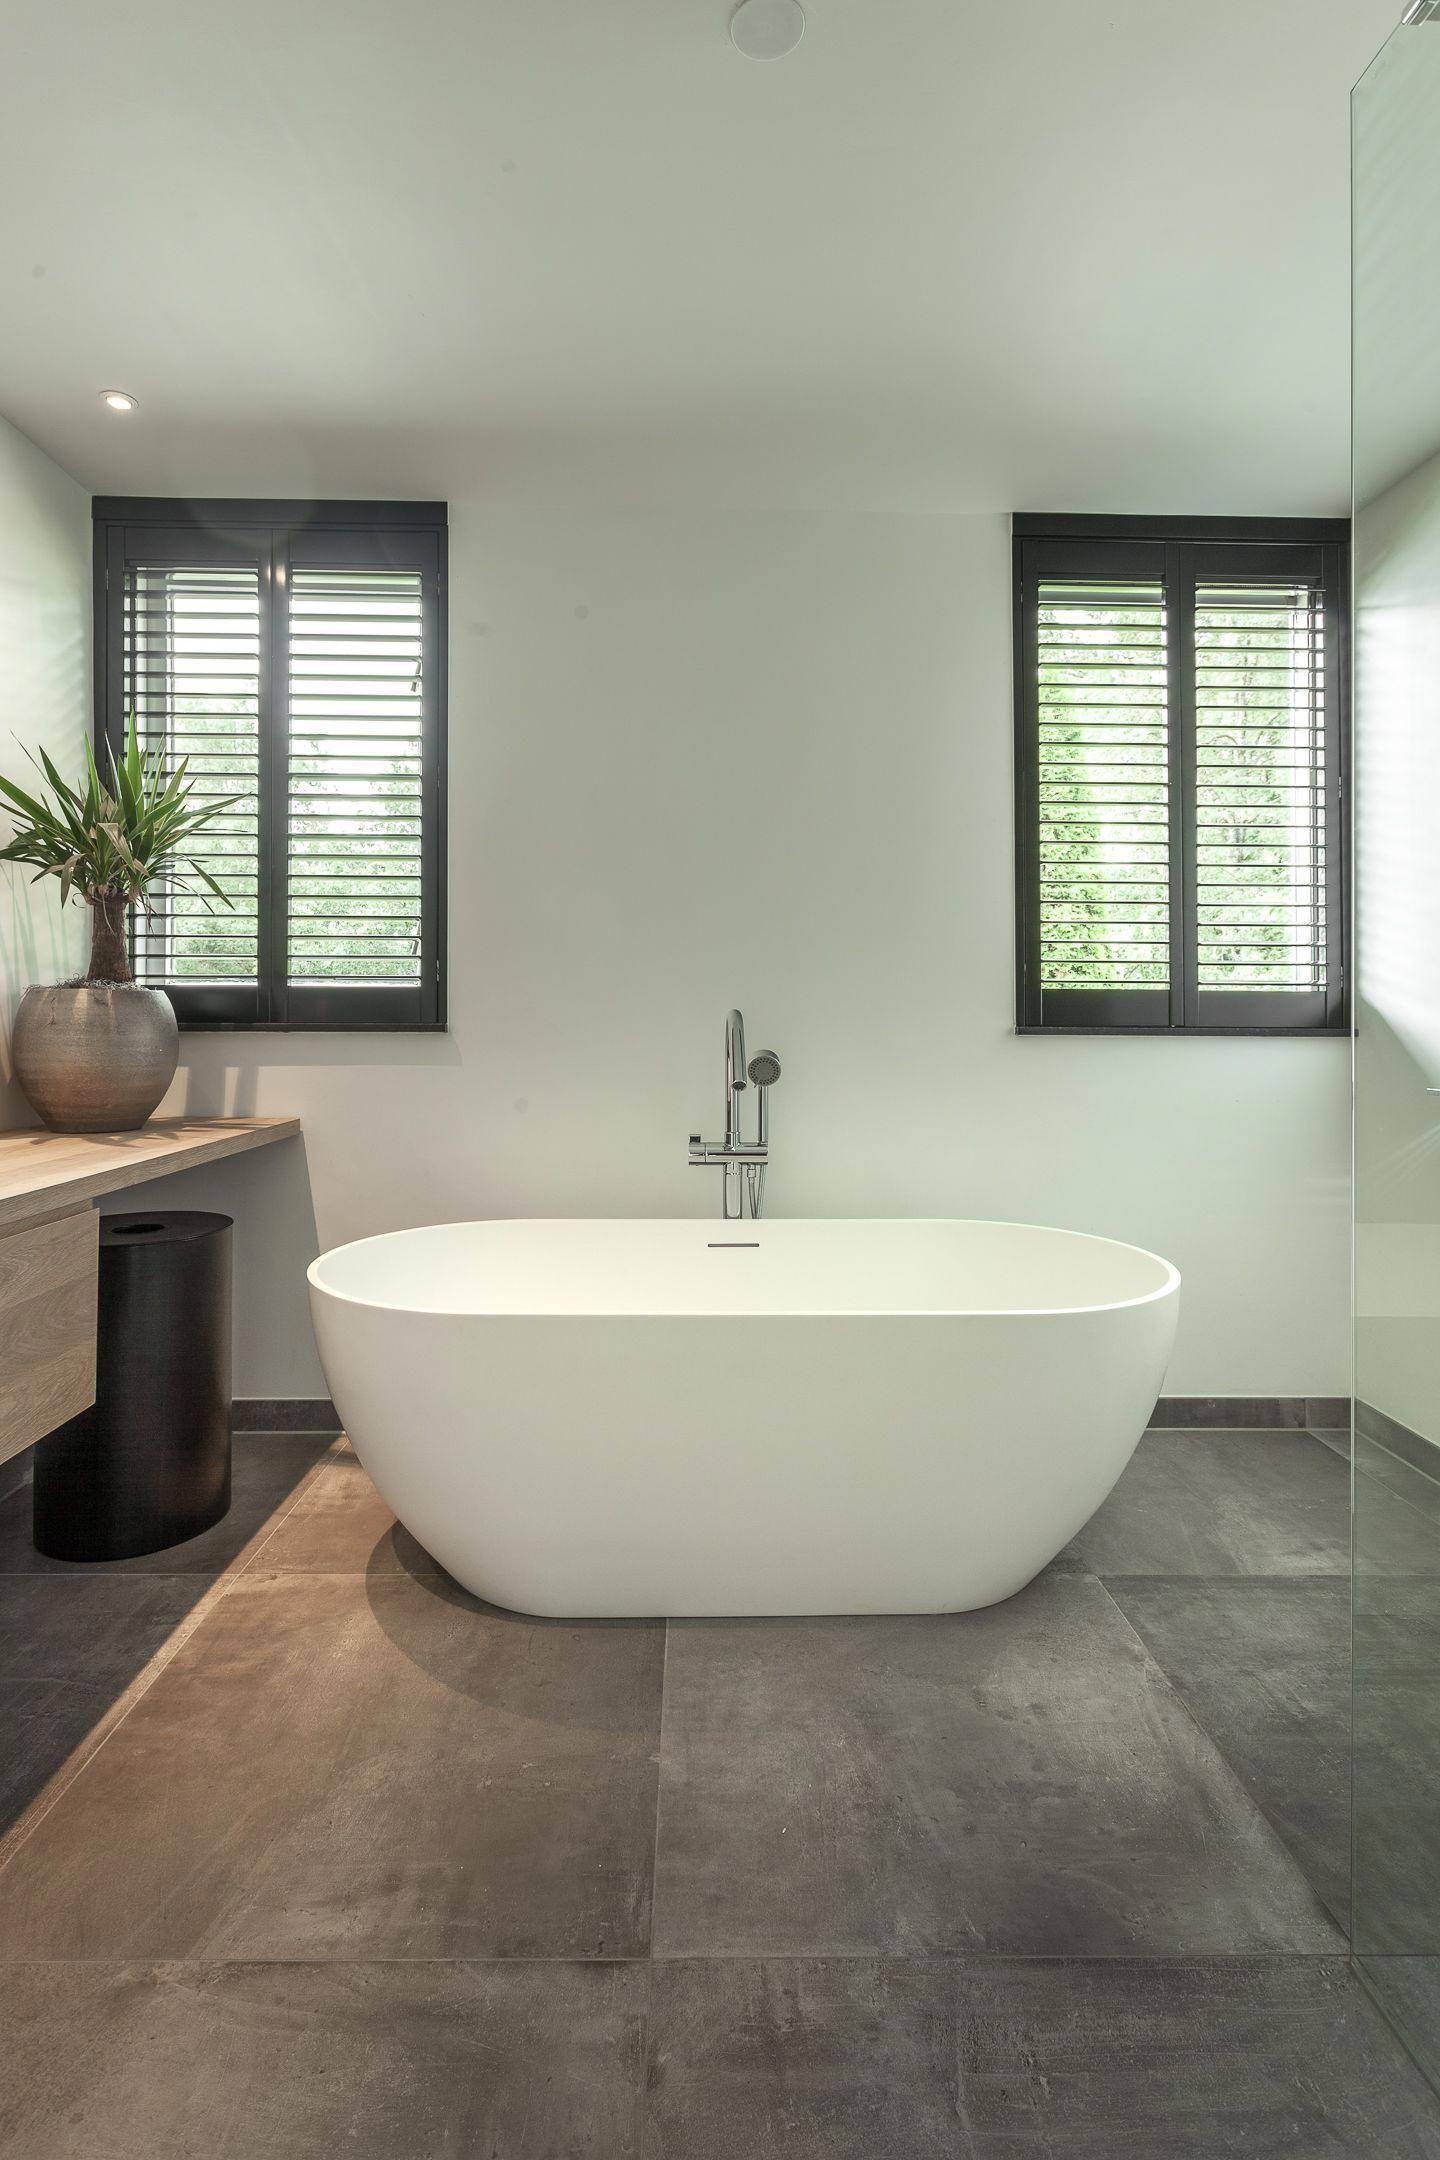 Photo of 31 WASHROOM LIGHTING IDEAS FOR EACH LAYOUT DESIGN #bathroomvanity #bathroomideas …